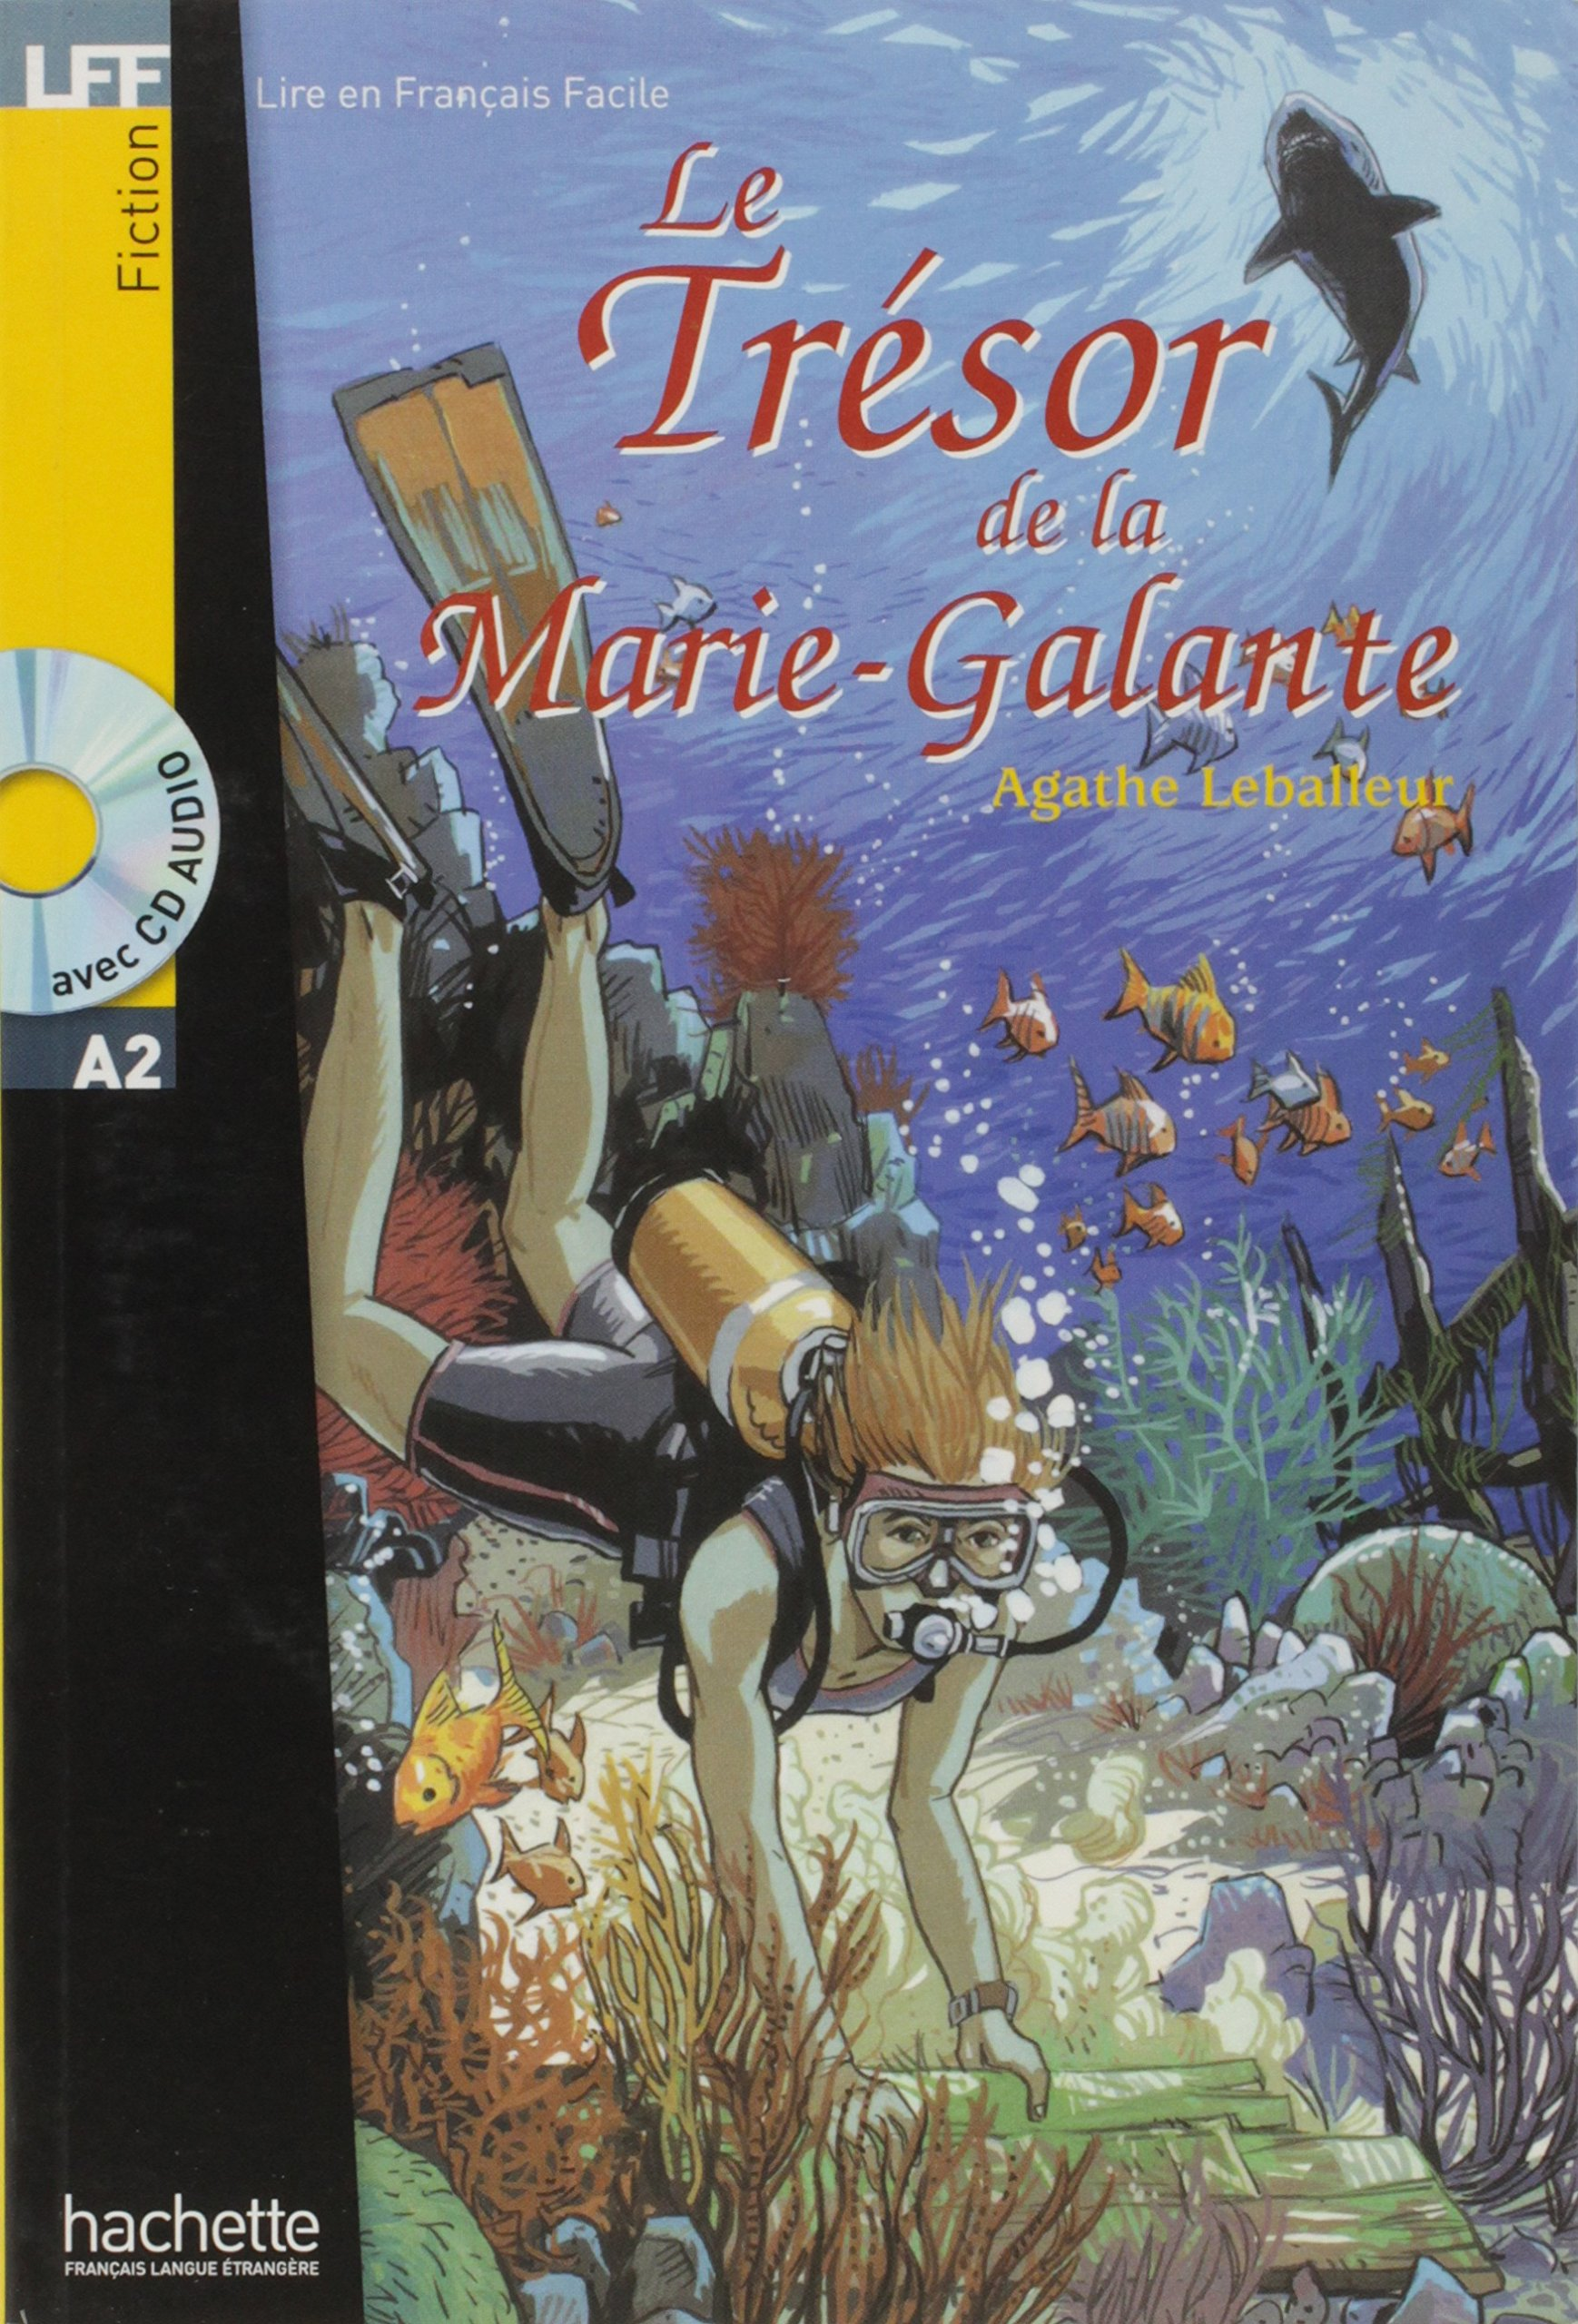 Le Tresor De La Marie-galante (Lire En Francais Facile) (French Edition) ePub fb2 book